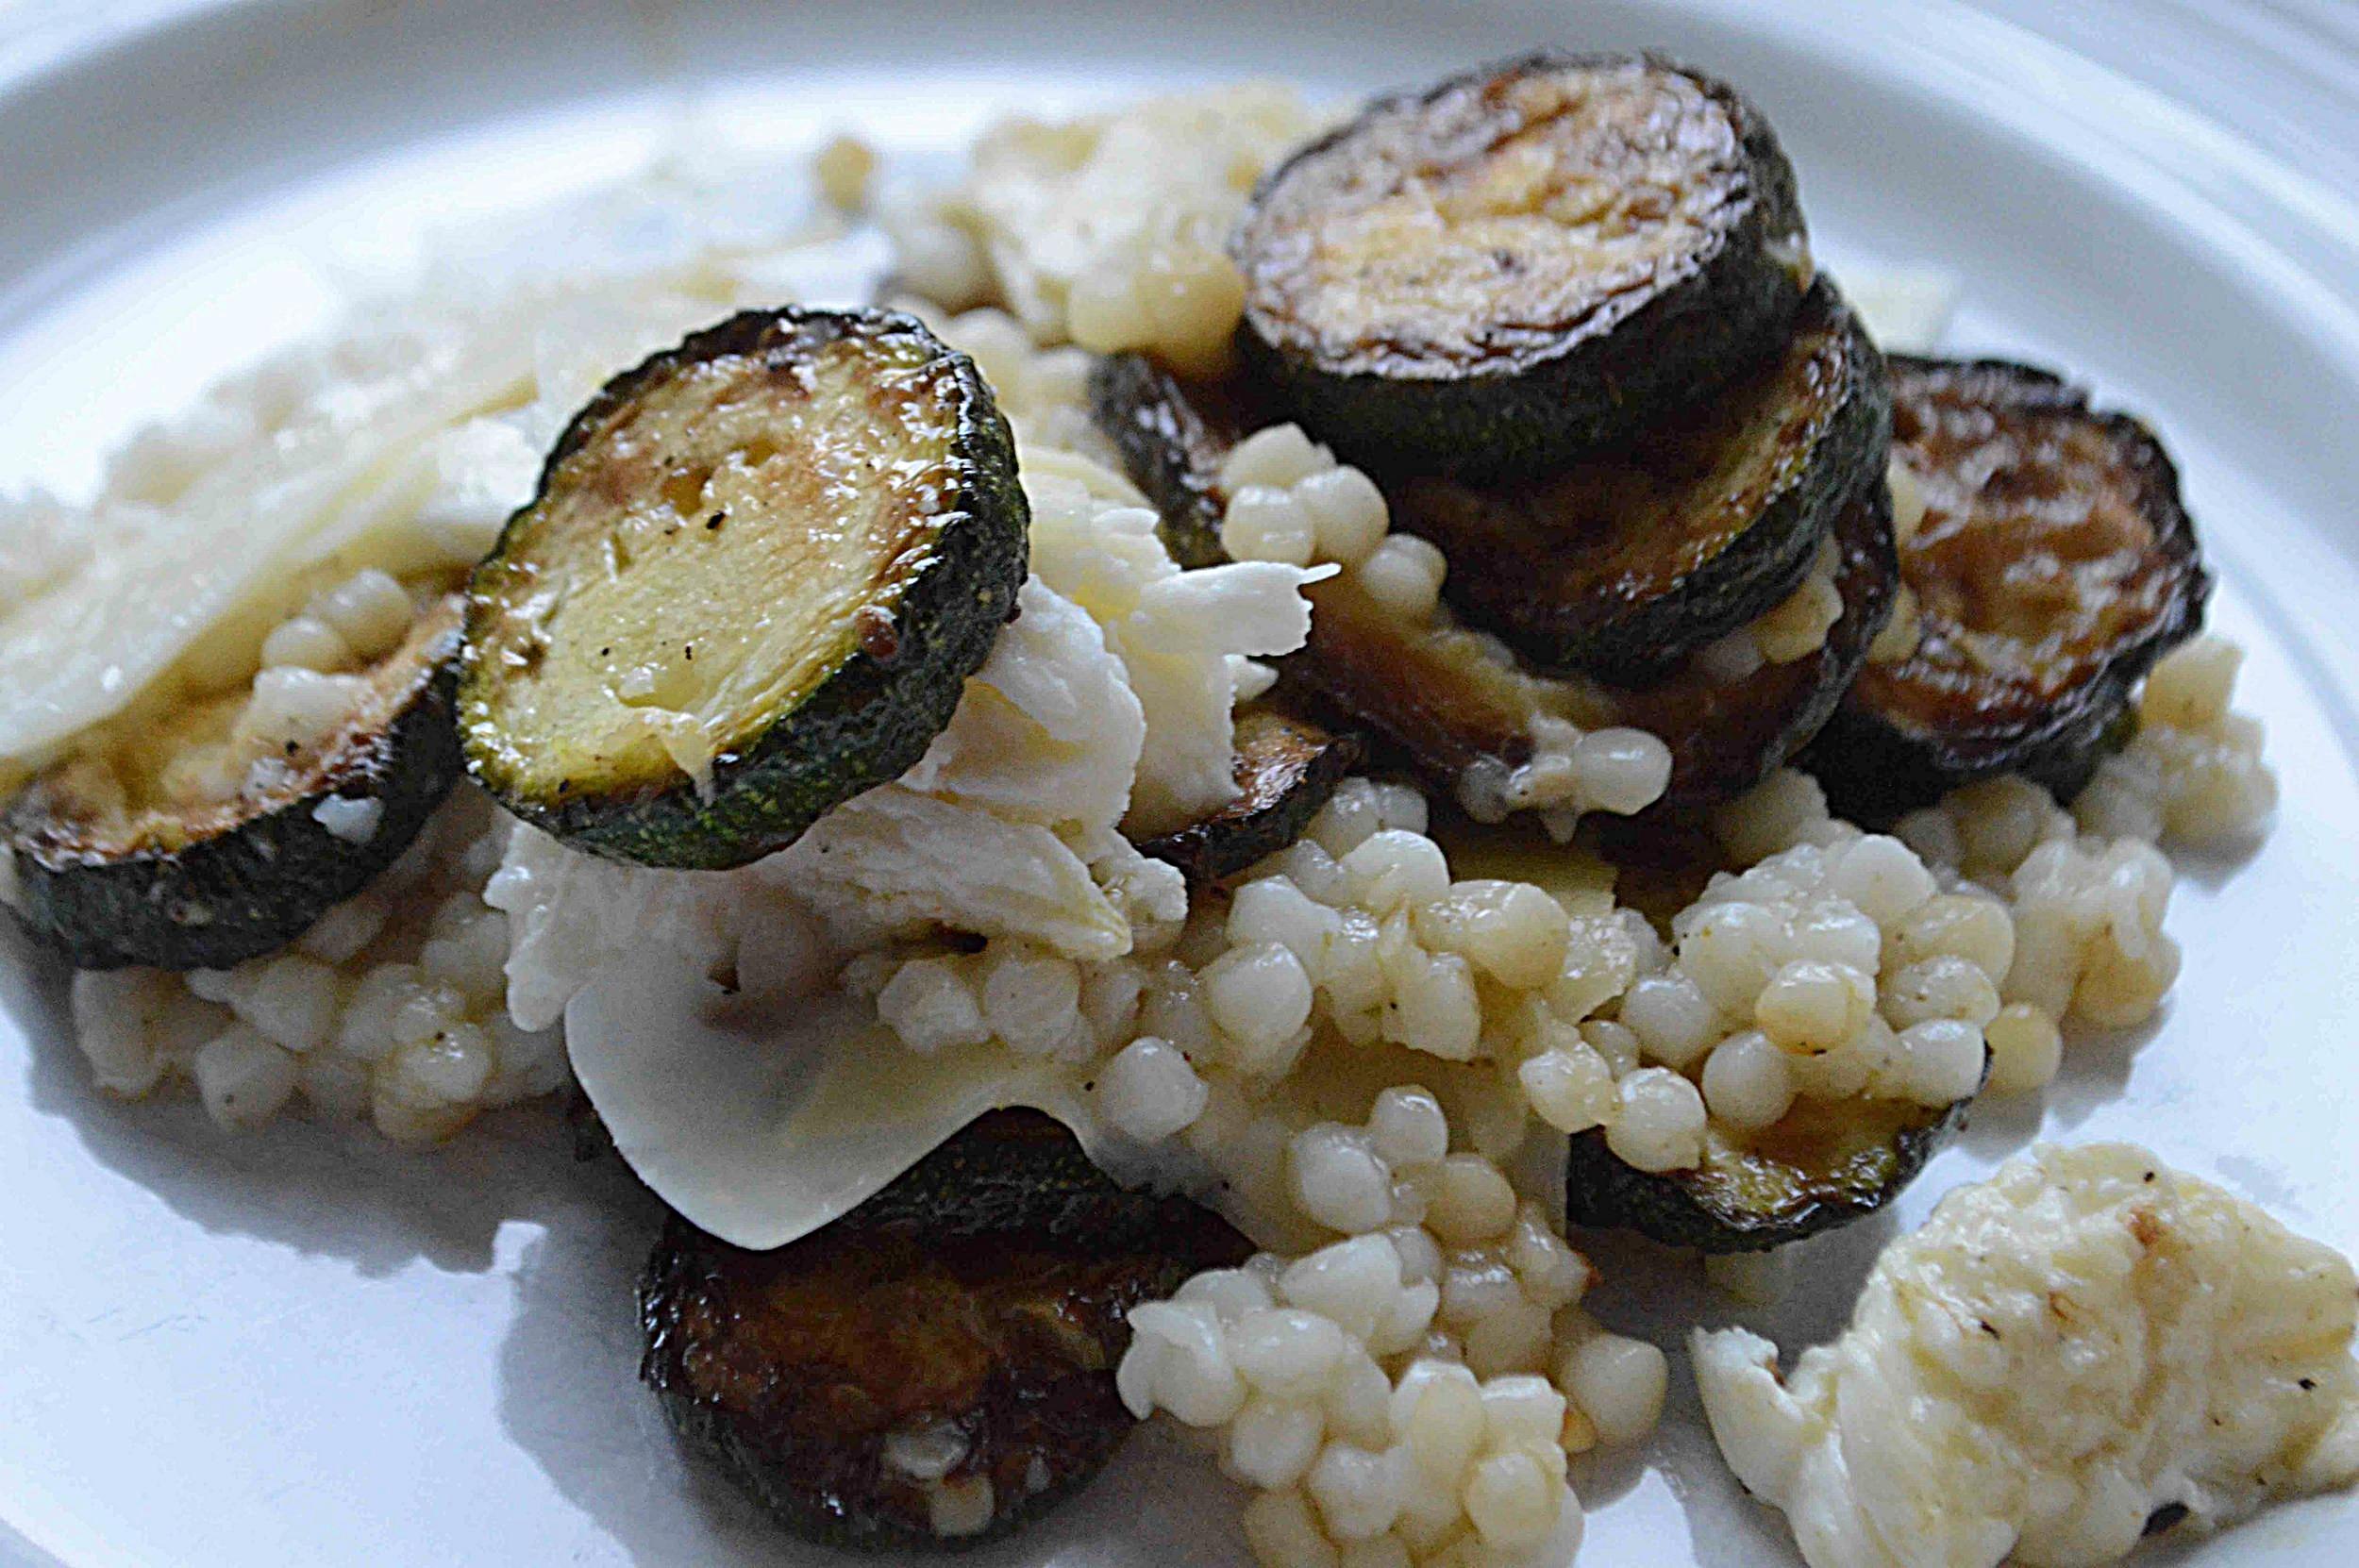 Grilled Zucchini, Mozzarella and Israeli Couscous